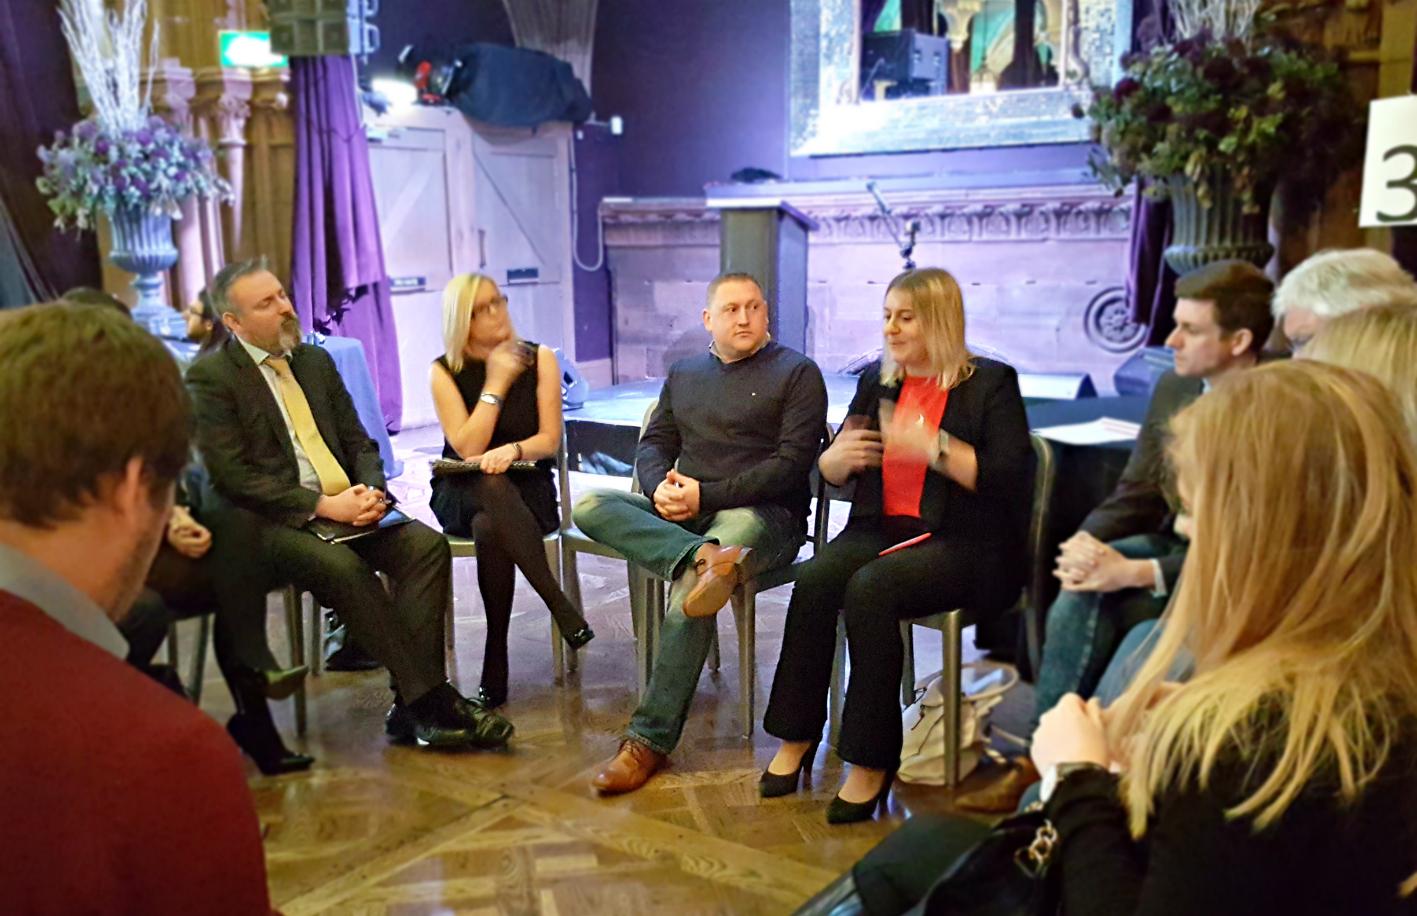 Wendy McDougall of FIrefish Software presents at truEdinburgh 2016